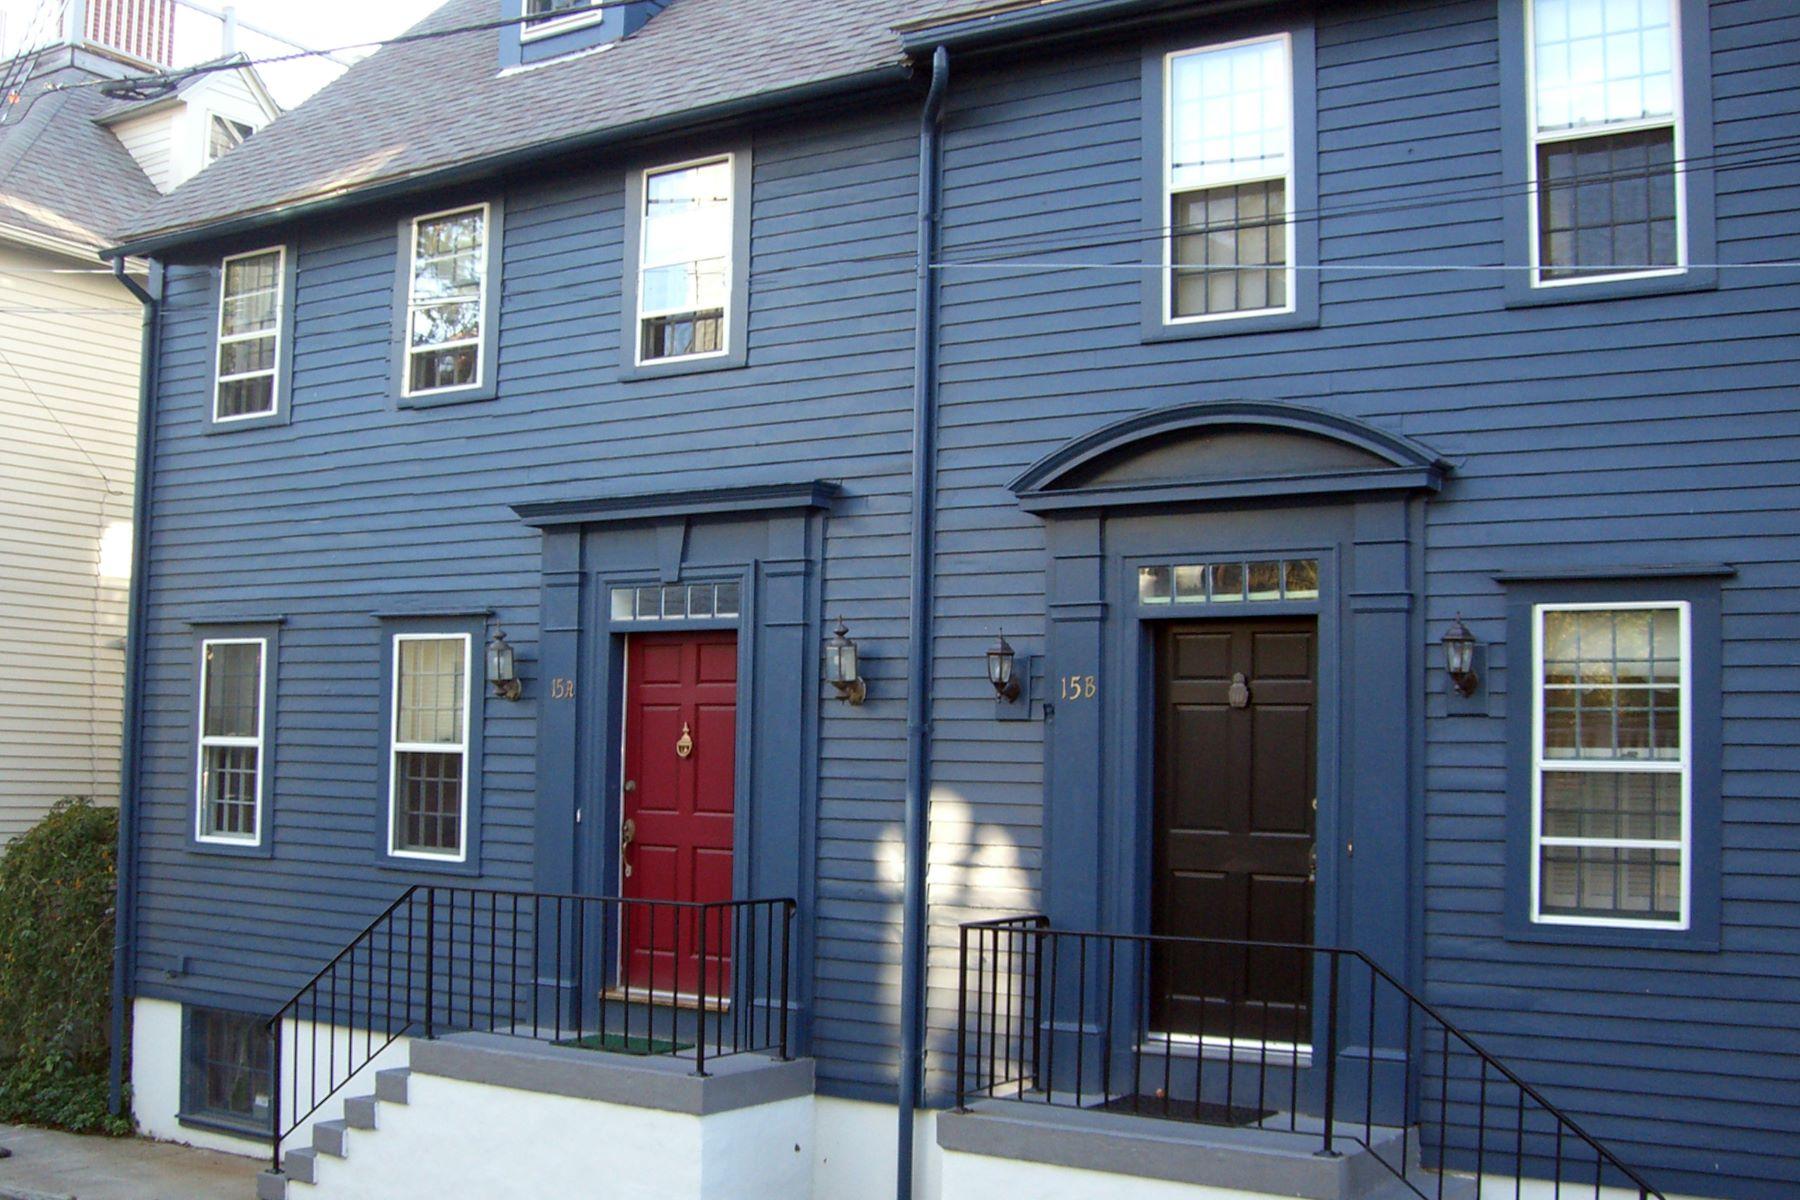 Condominium for Sale at Historic Hill 15 A Corne Street Newport, Rhode Island 02840 United States